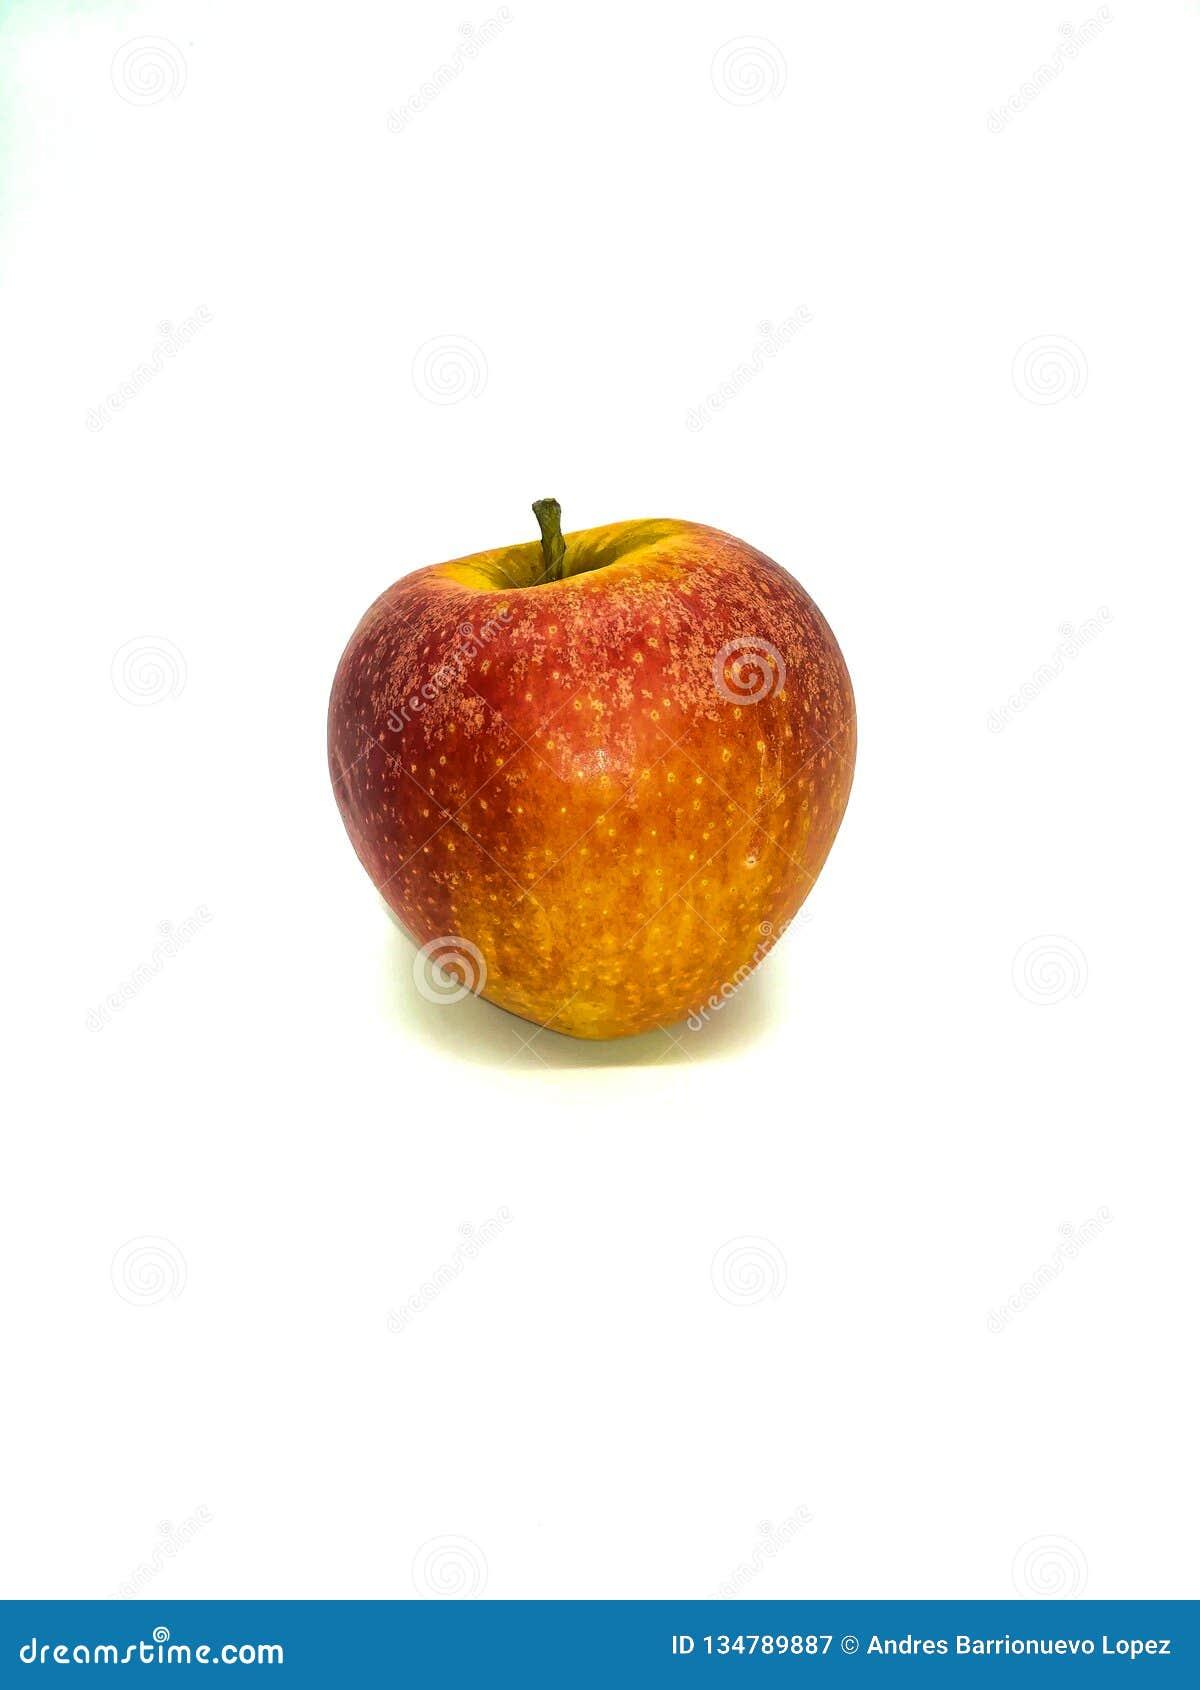 Manzana roja con tonos amarillos